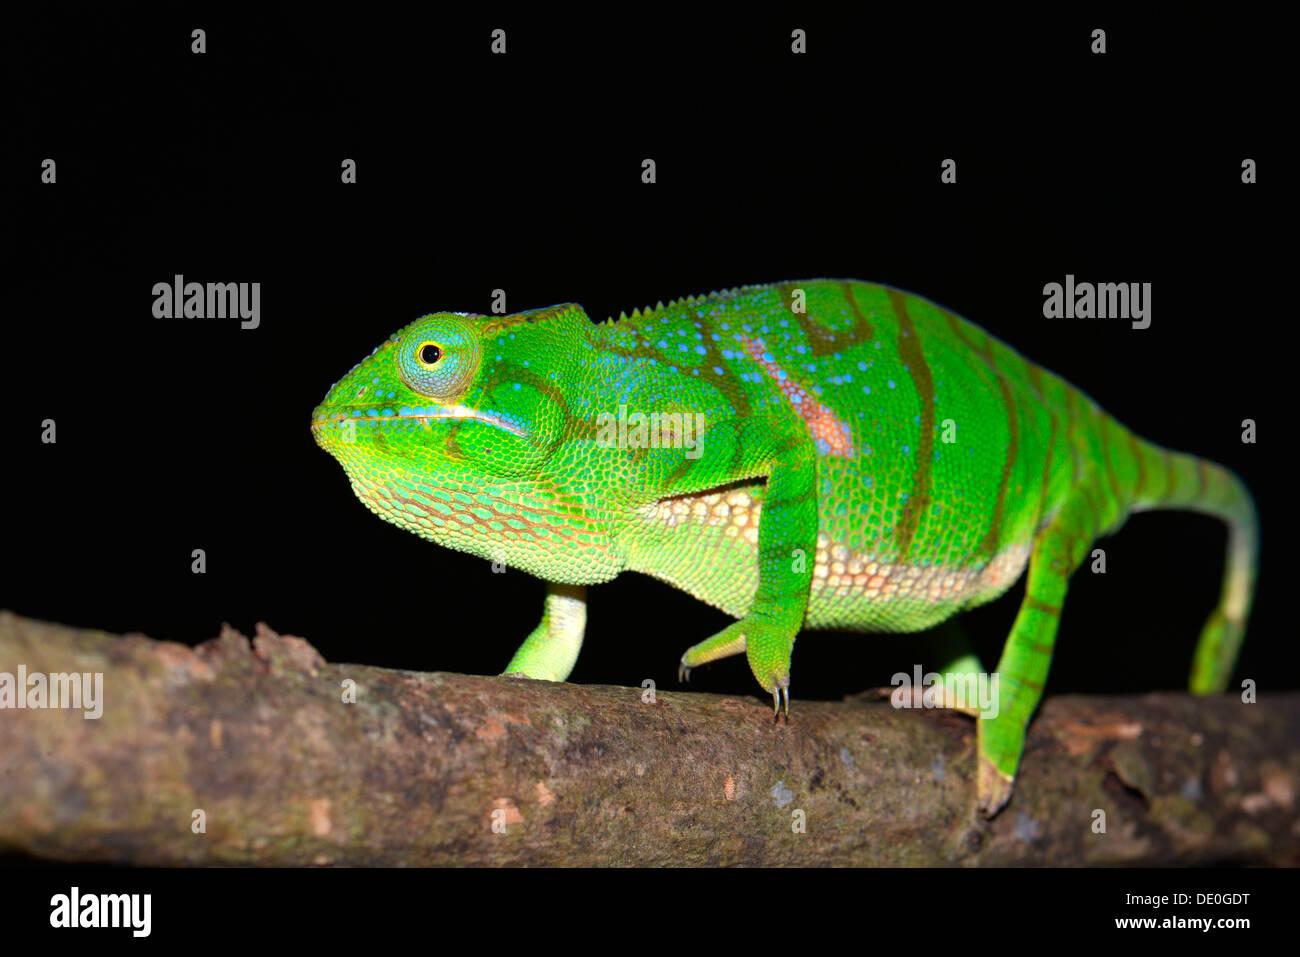 Timoni Chamäleon (Furcifer Timoni), einer neu entdeckten Spezies Chamäleon Stockbild